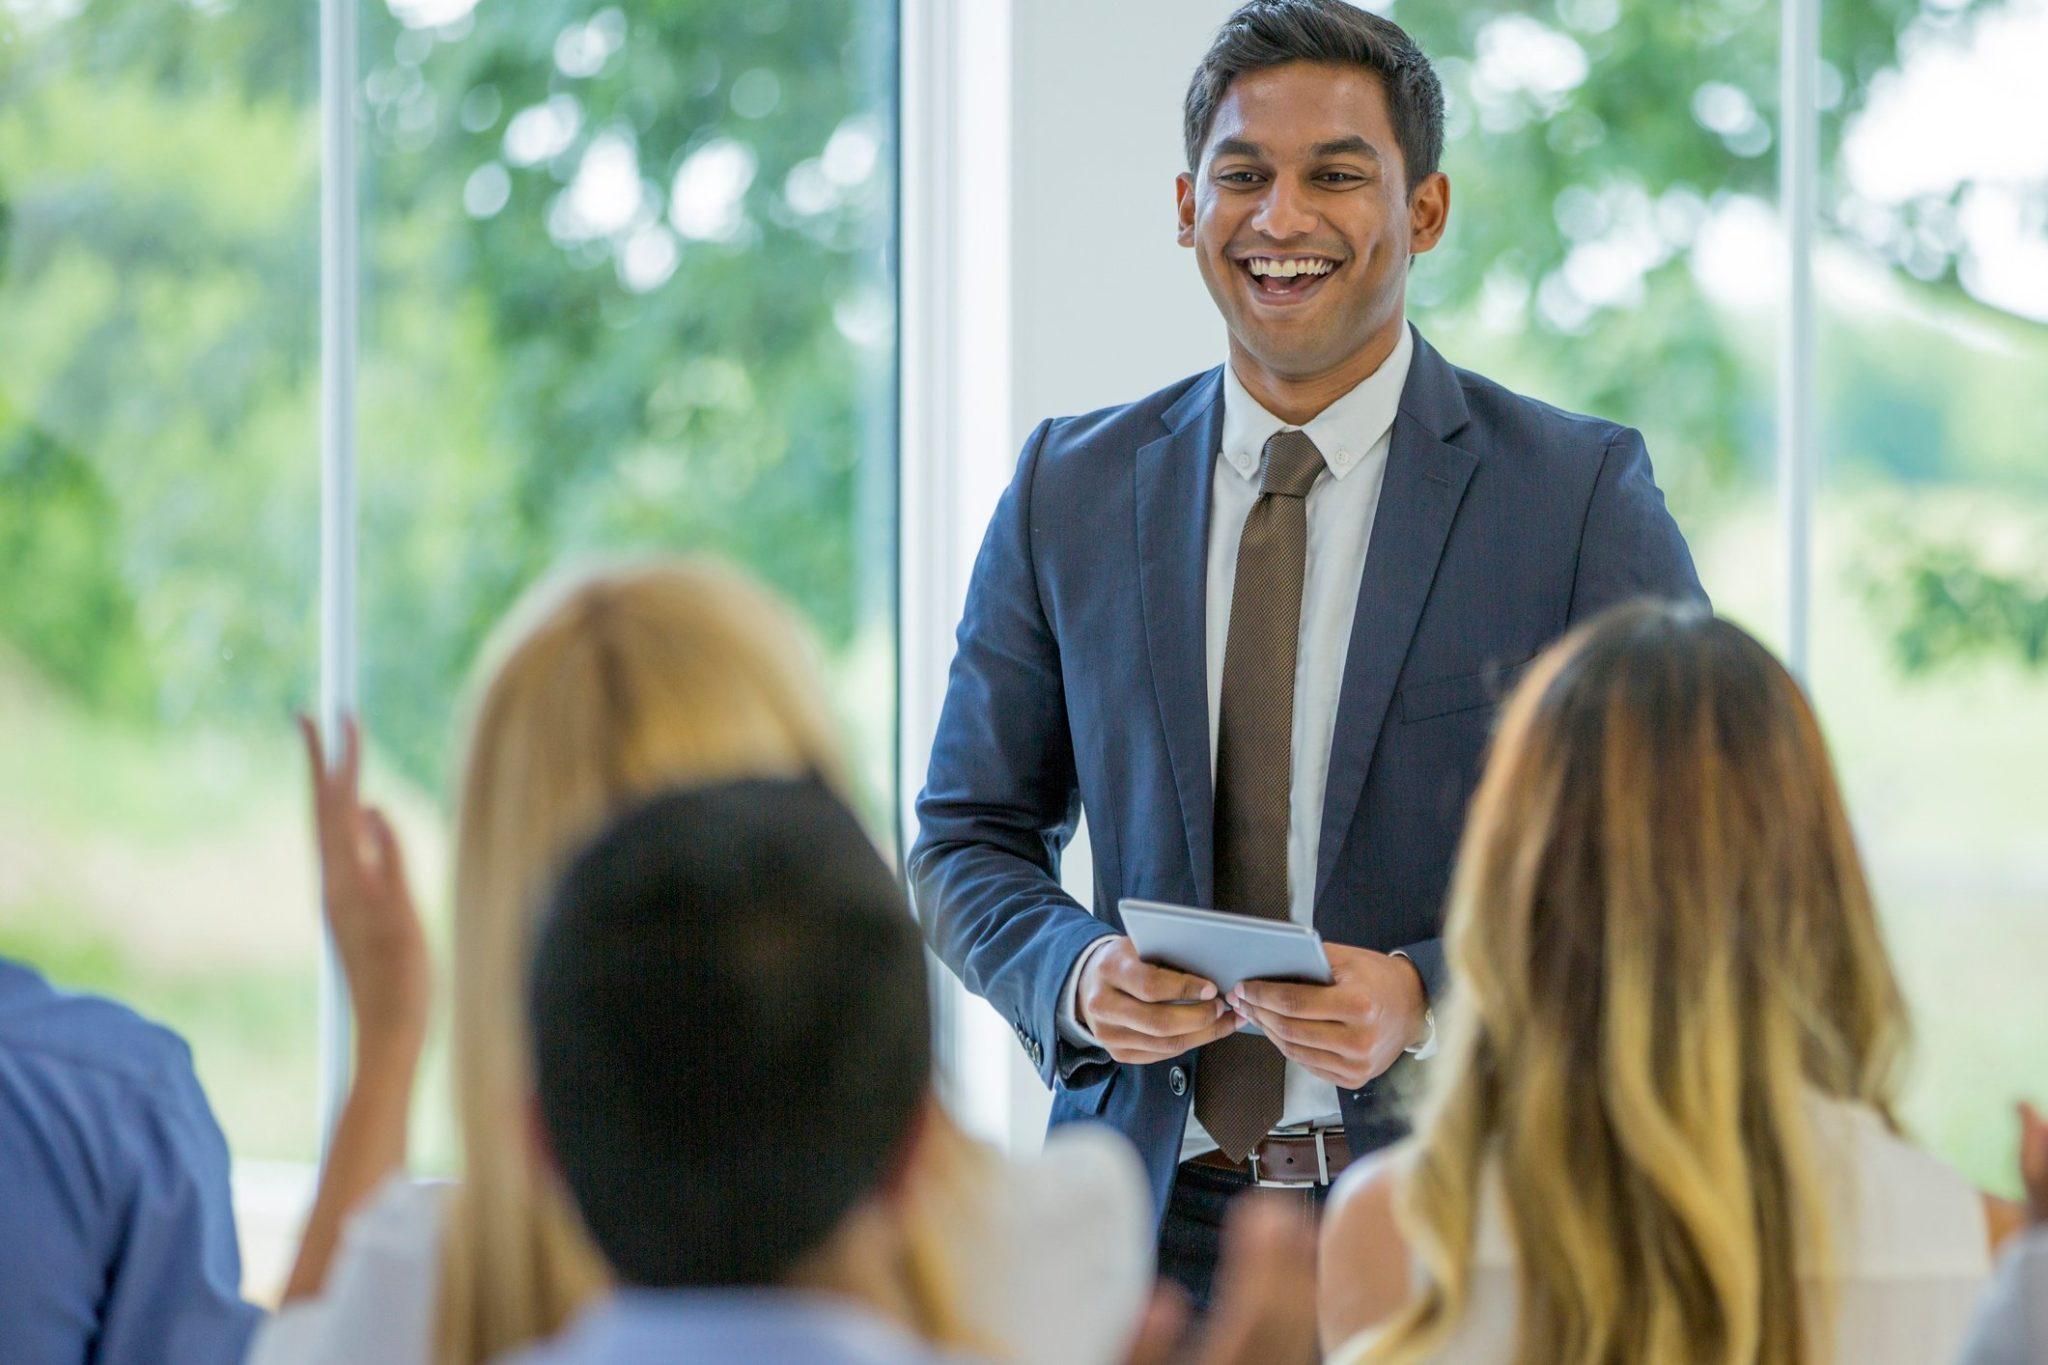 Man hosting presentation